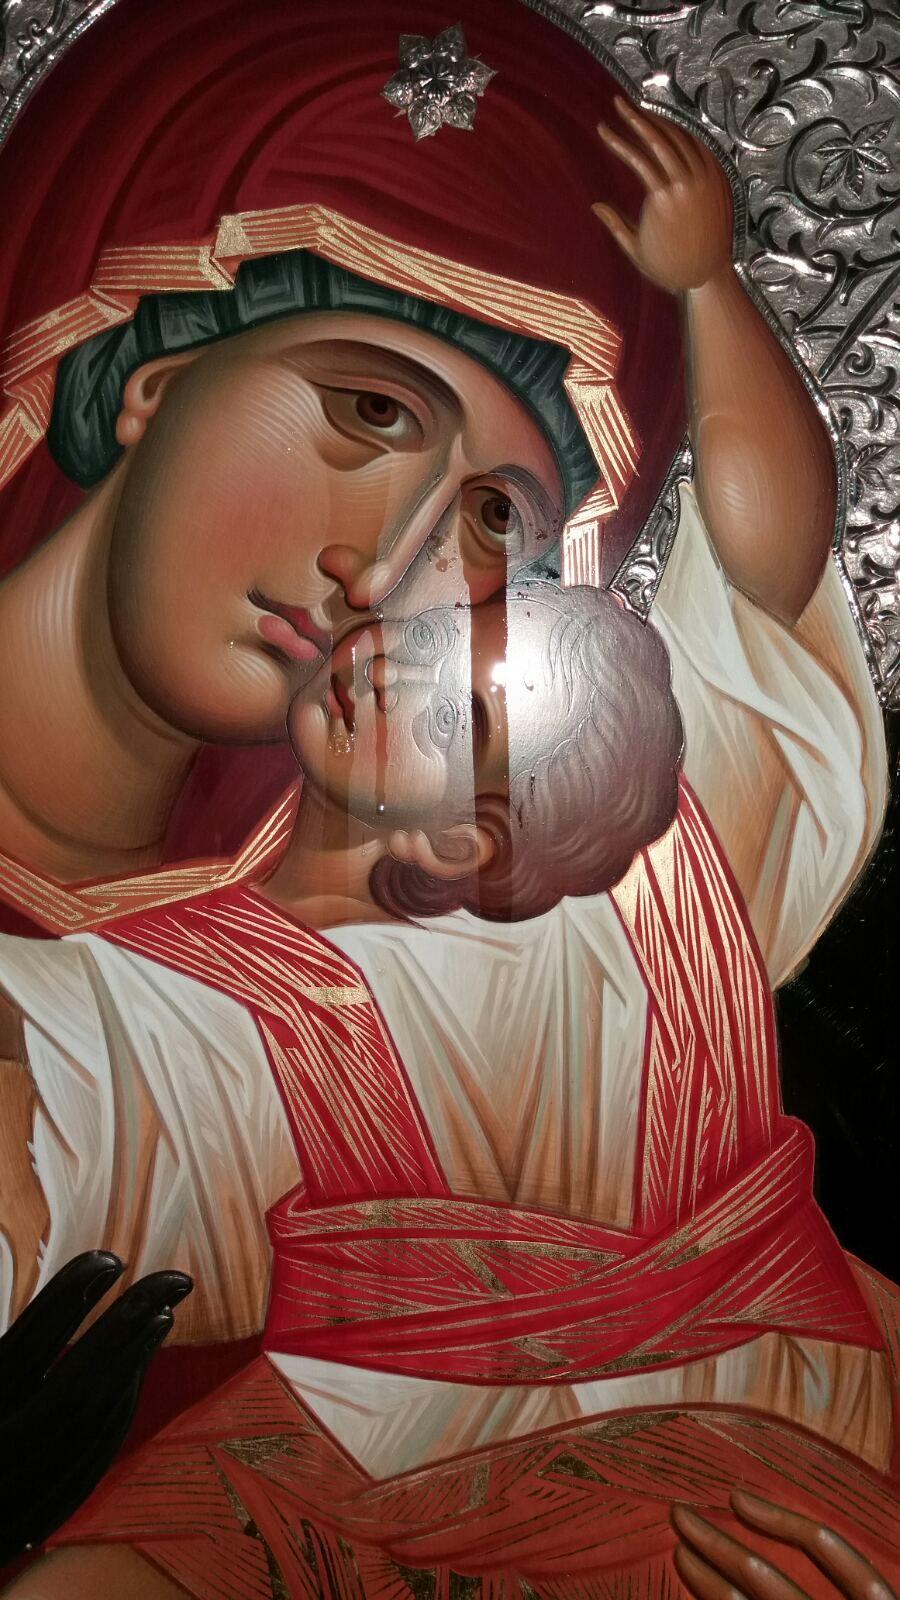 Une icône de la vierge a pleuré en Grêce